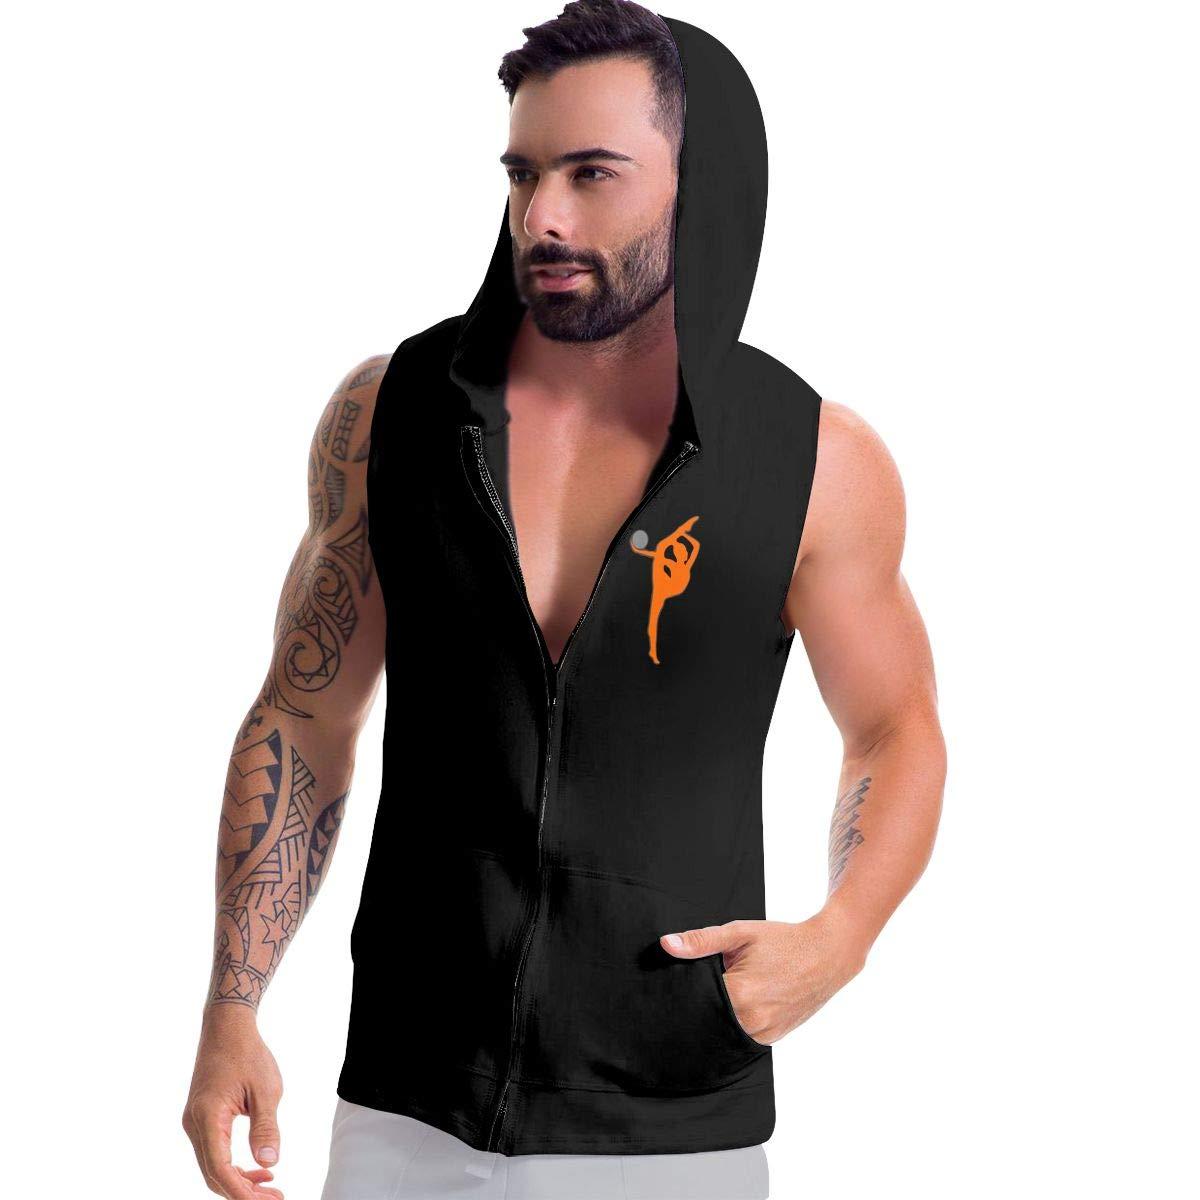 BMWEITIHBQ Mens Sleeveless Sweatshirt Rhythmic Gymnastics Gray Zip Up Vest